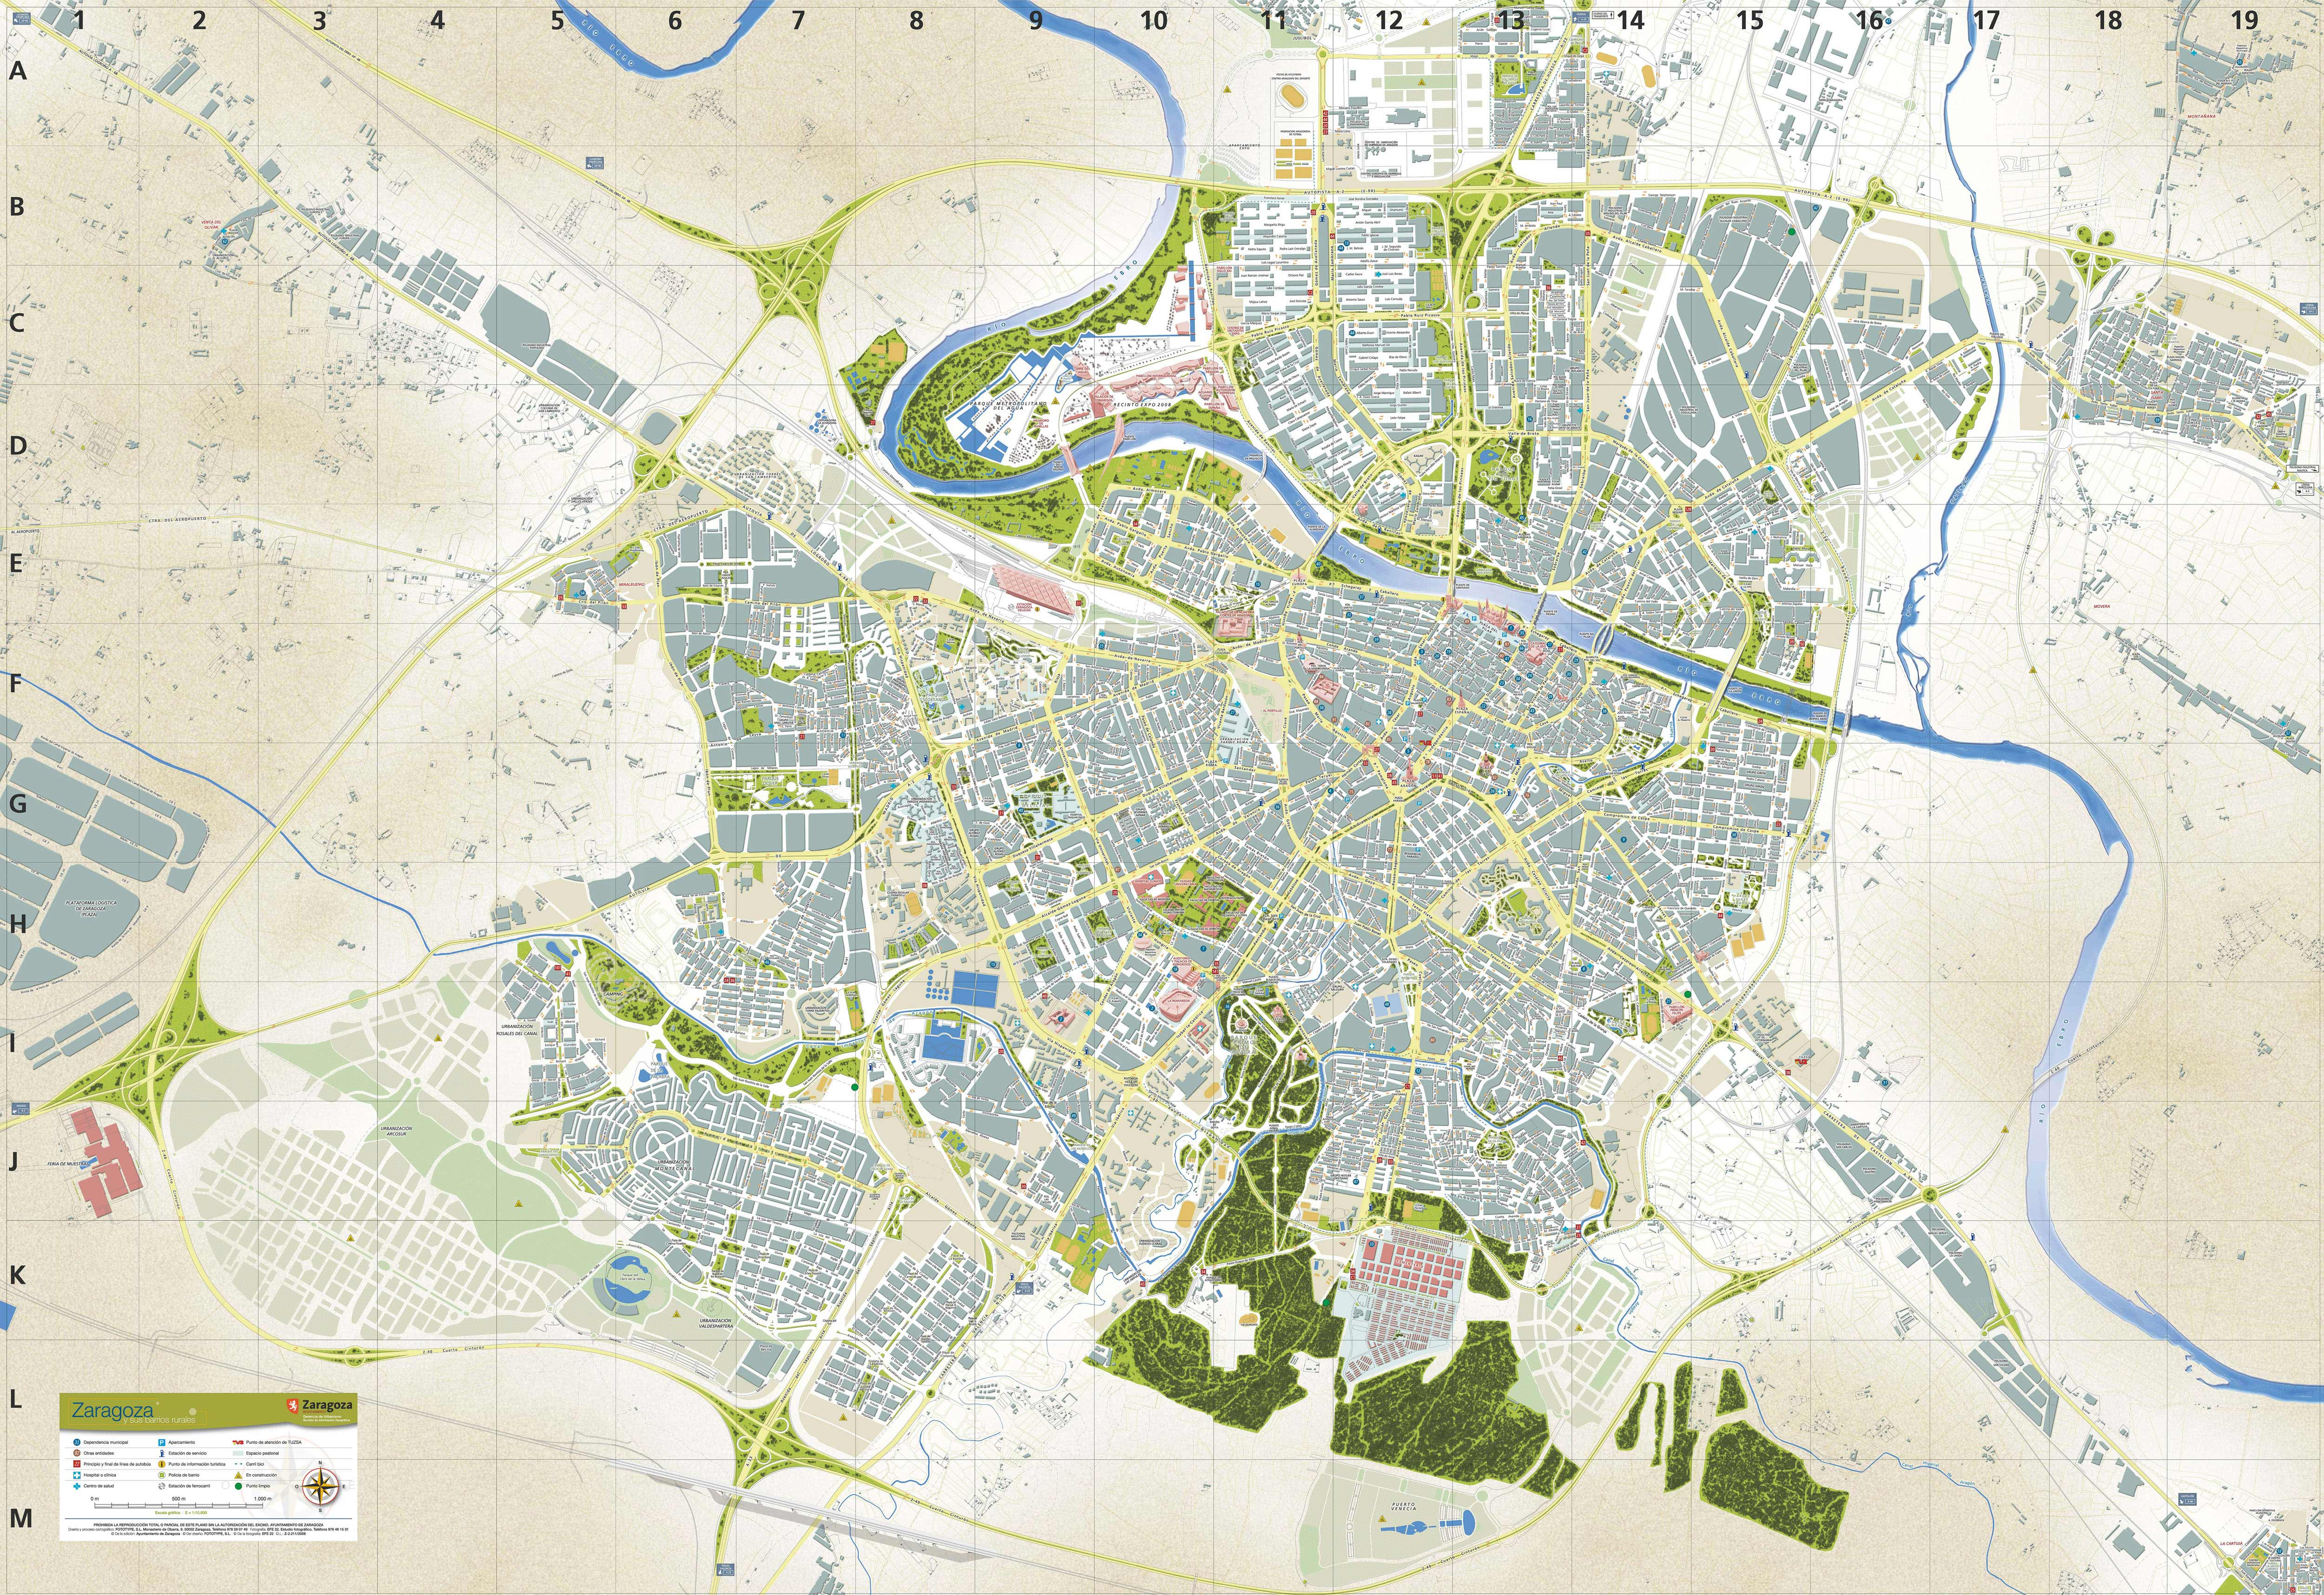 zaragoza mapa Large Zaragoza Maps for Free Download and Print   High Resolution  zaragoza mapa